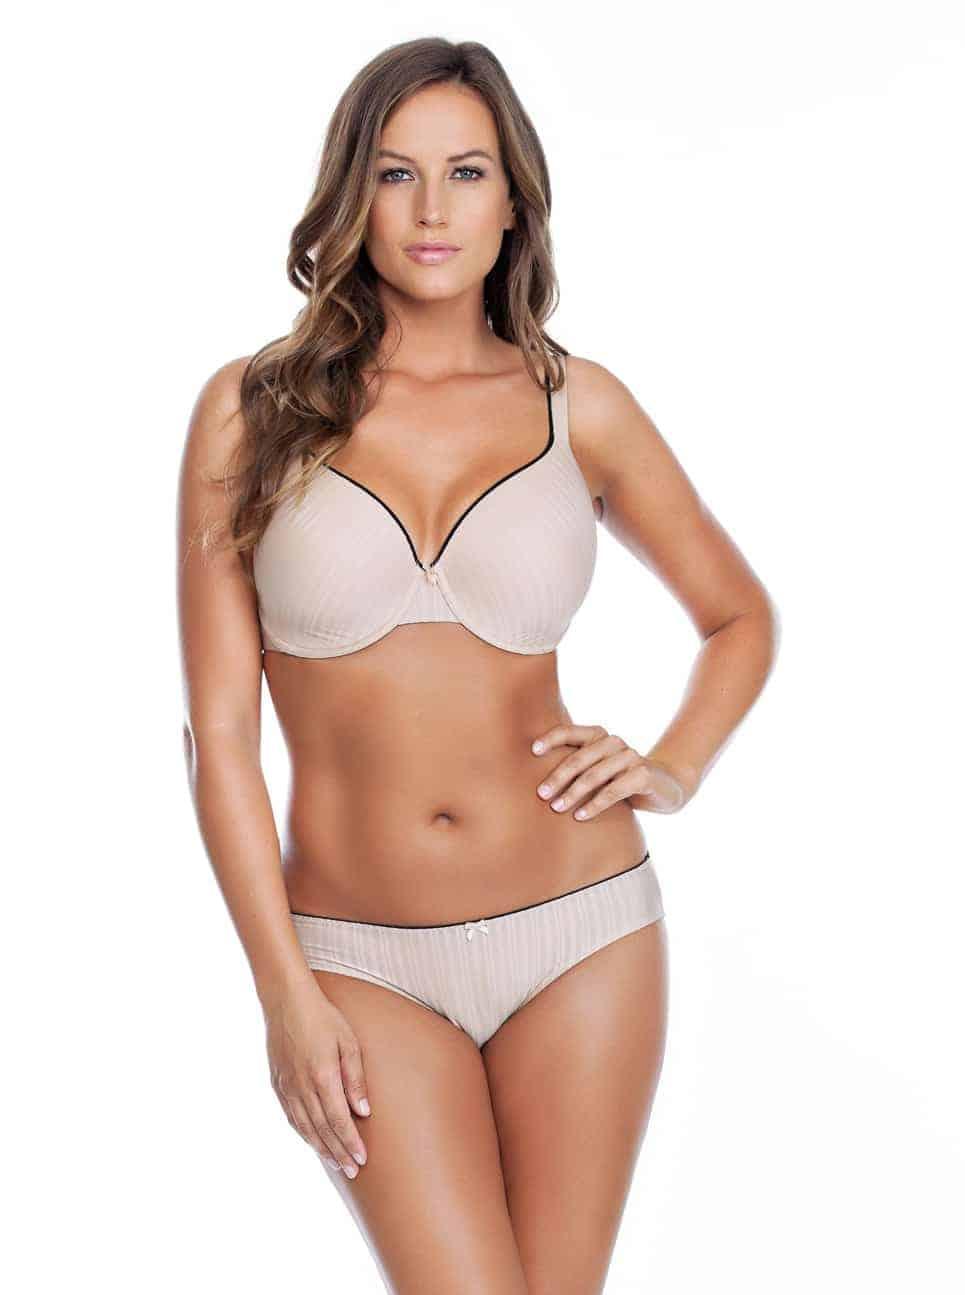 Aline TshirtBraP5251 BikiniP5253 Nude Front 1 - Aline Bikini - Nude - P5253